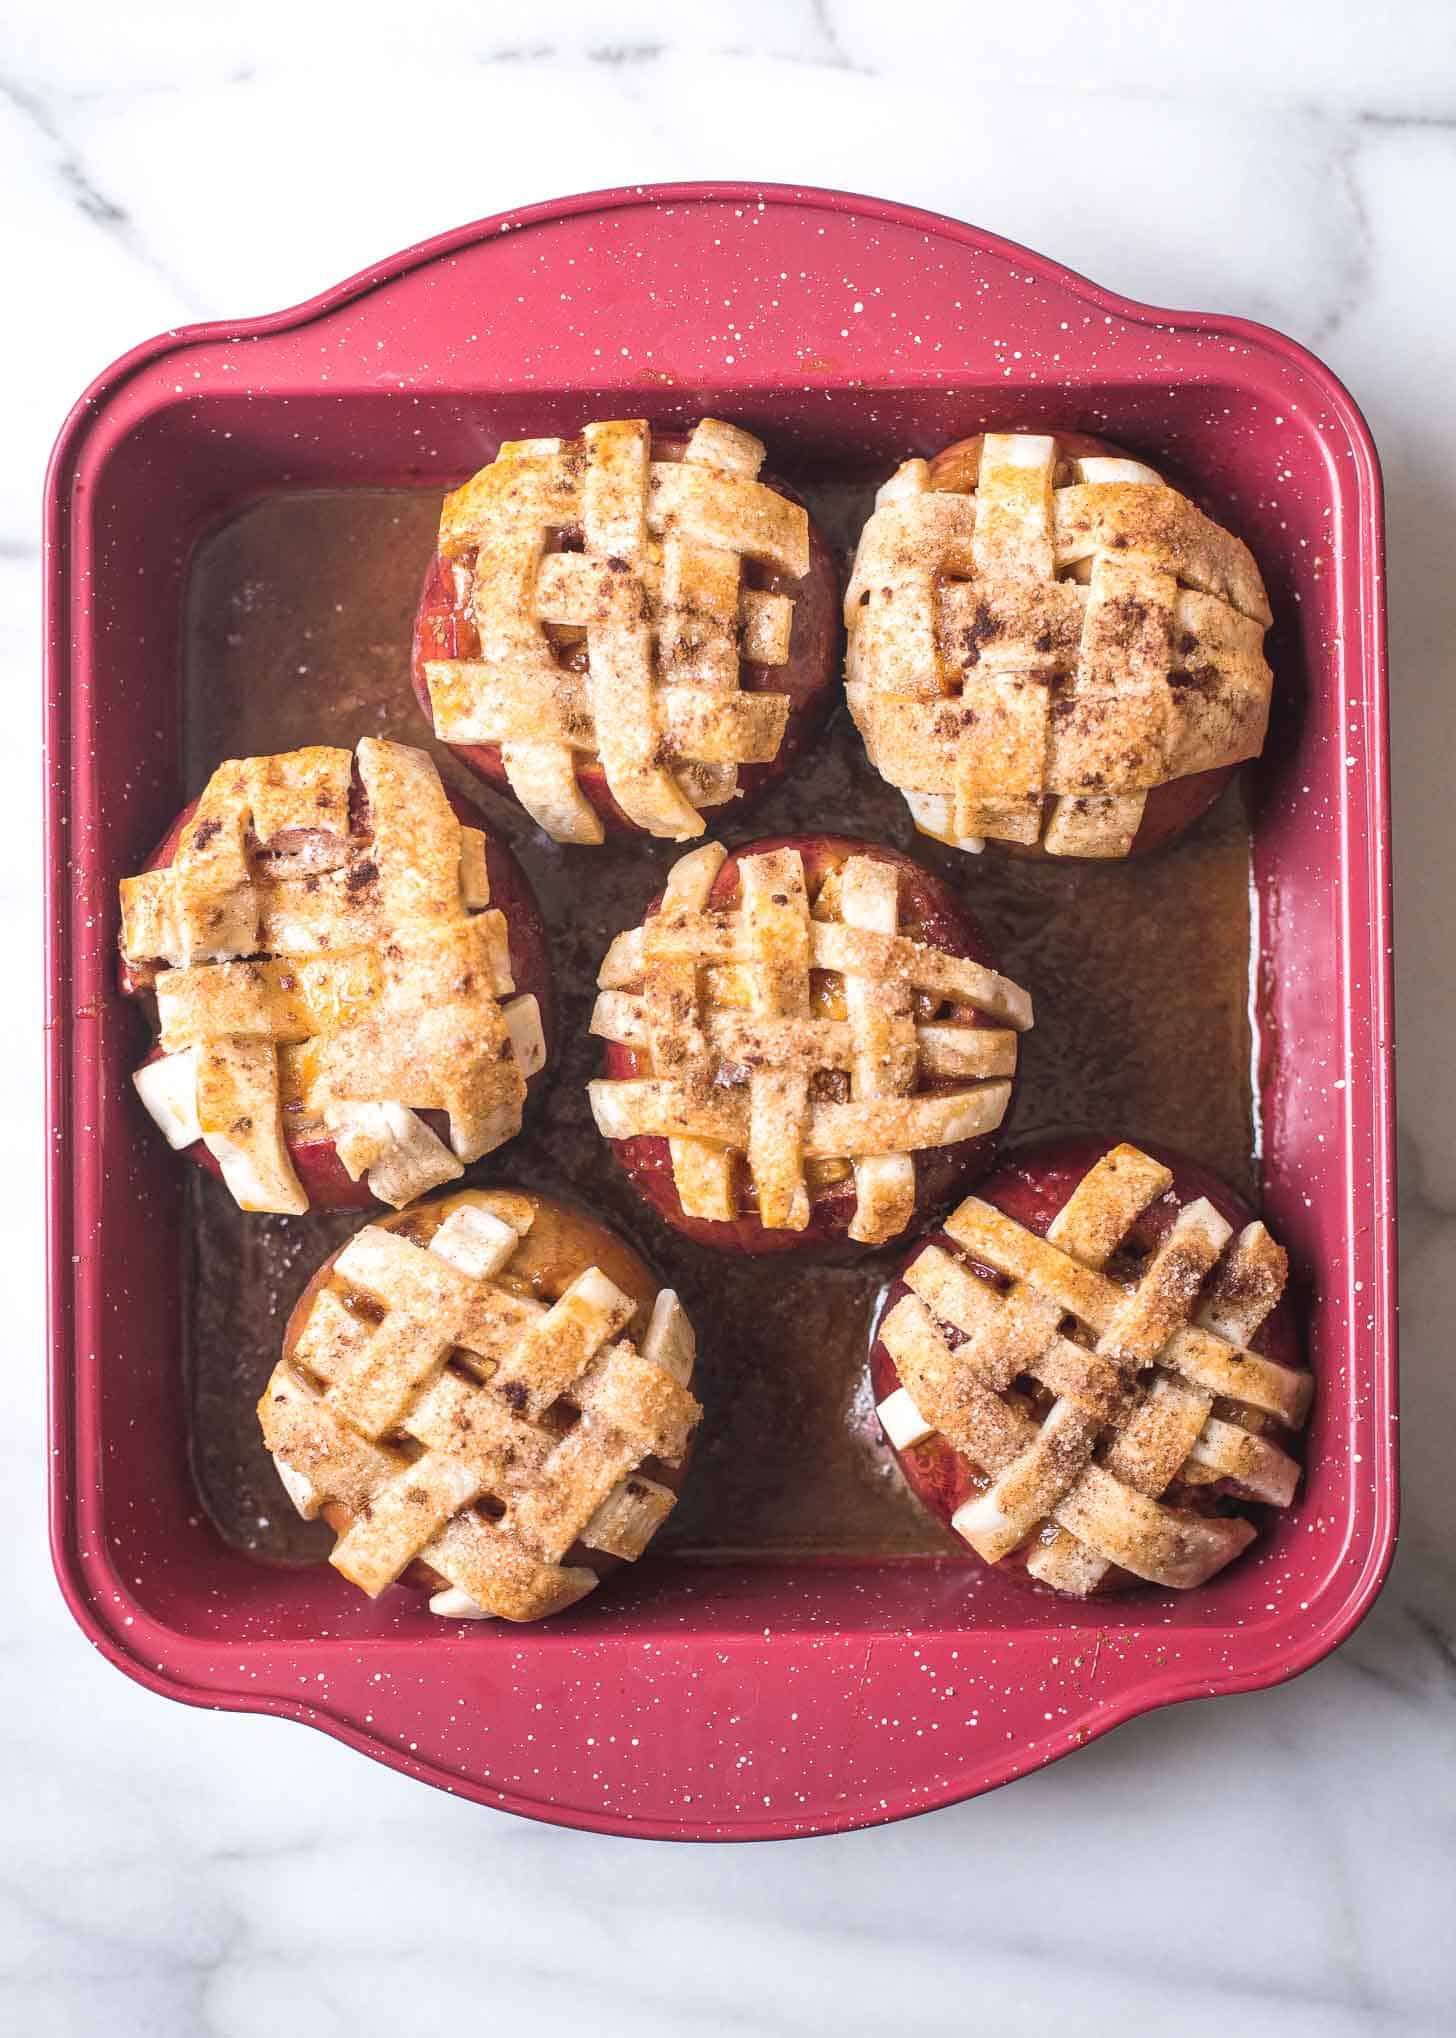 Caramel Apple Pie Baked Apples